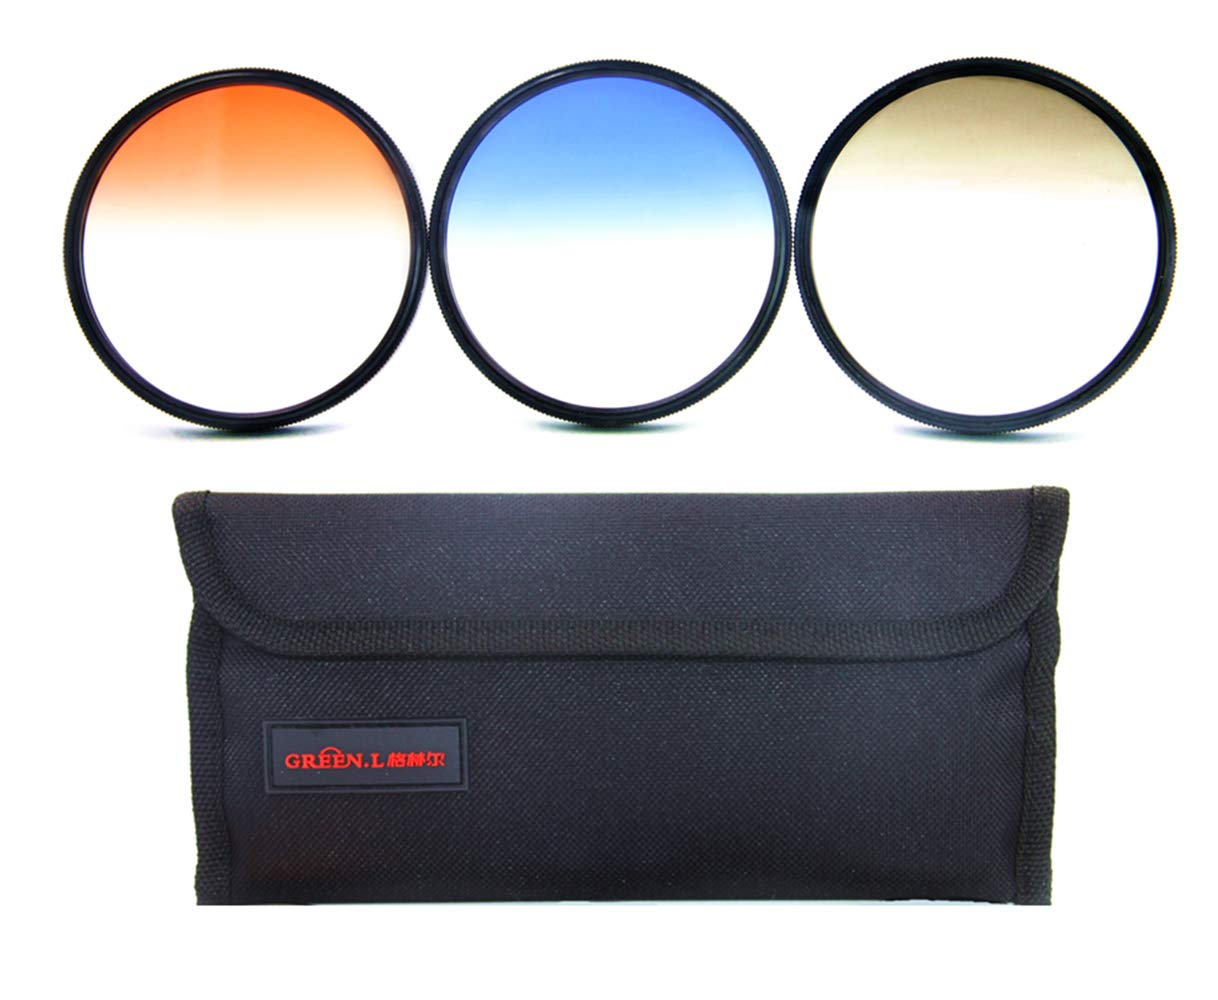 GREEN.L 77mm Color Graduated Neutral Density(ND4) Orange Blue Filter Slim Adjustable Filter Set for Digital Camera with Filter Pouch by Green-L